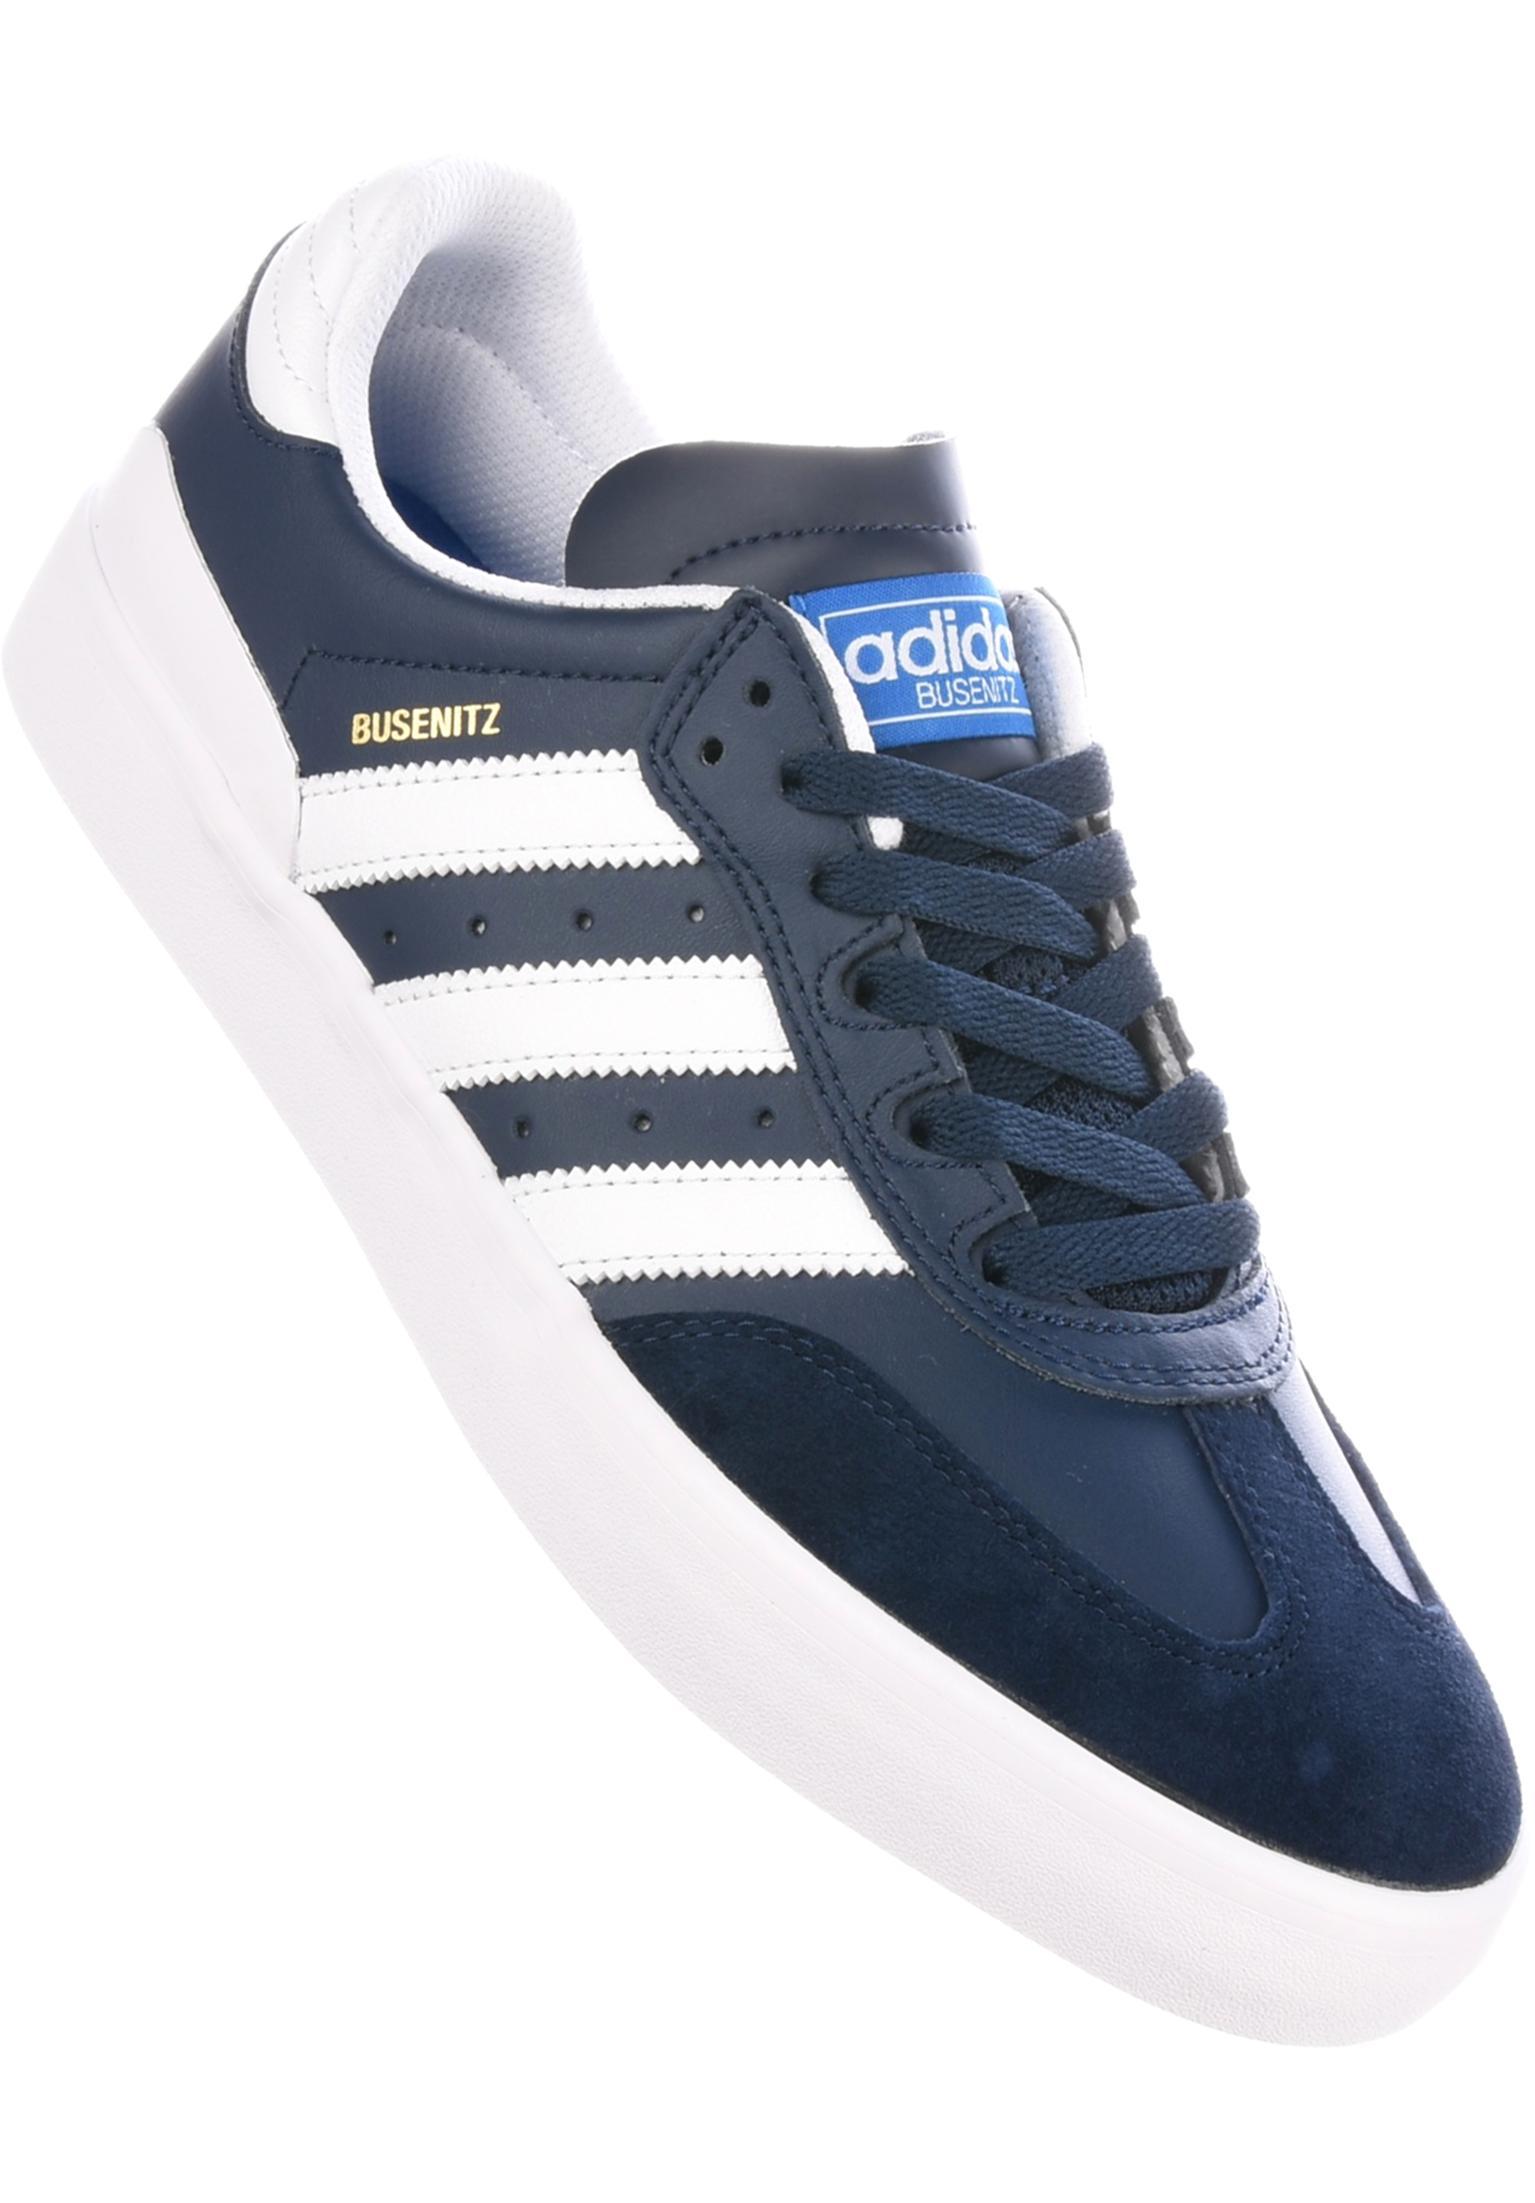 Busenitz Vulc Samba Edition adidas-skateboarding All Shoes in  navy-white-bluebird for Men  acb8da37e